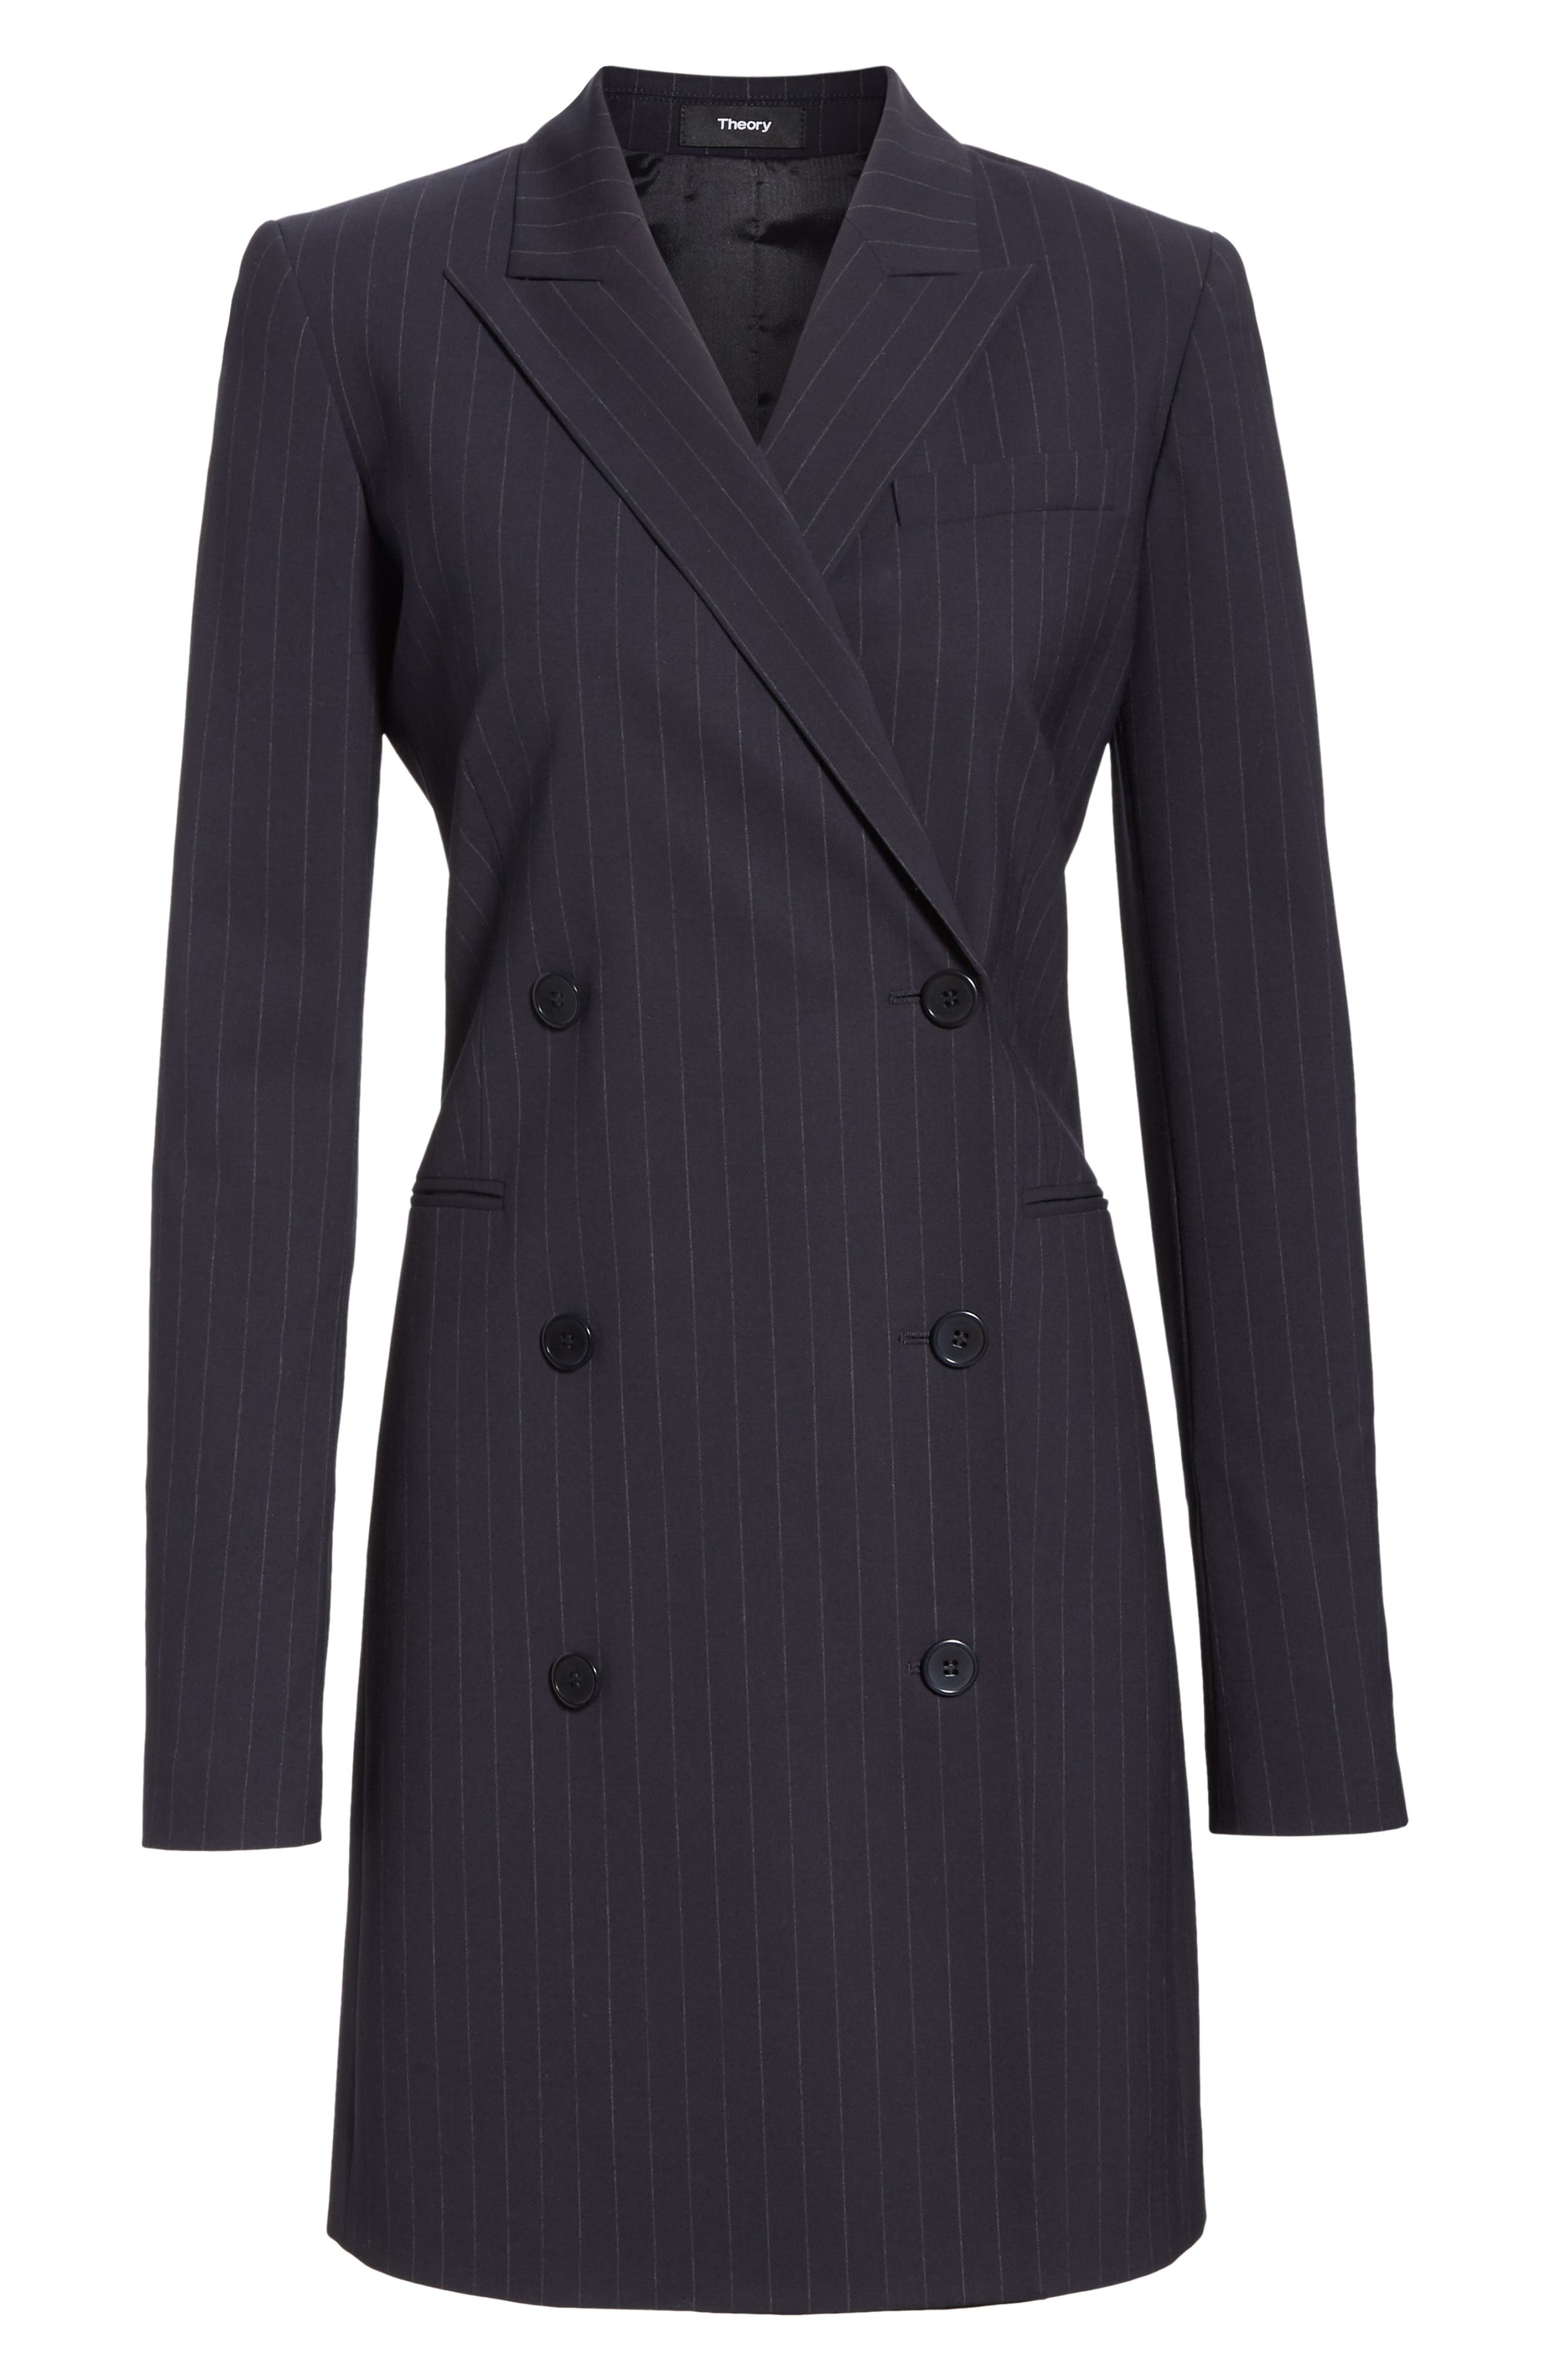 Pinstripe Blazer Dress,                             Alternate thumbnail 6, color,                             DEEP NAVY/ GREY